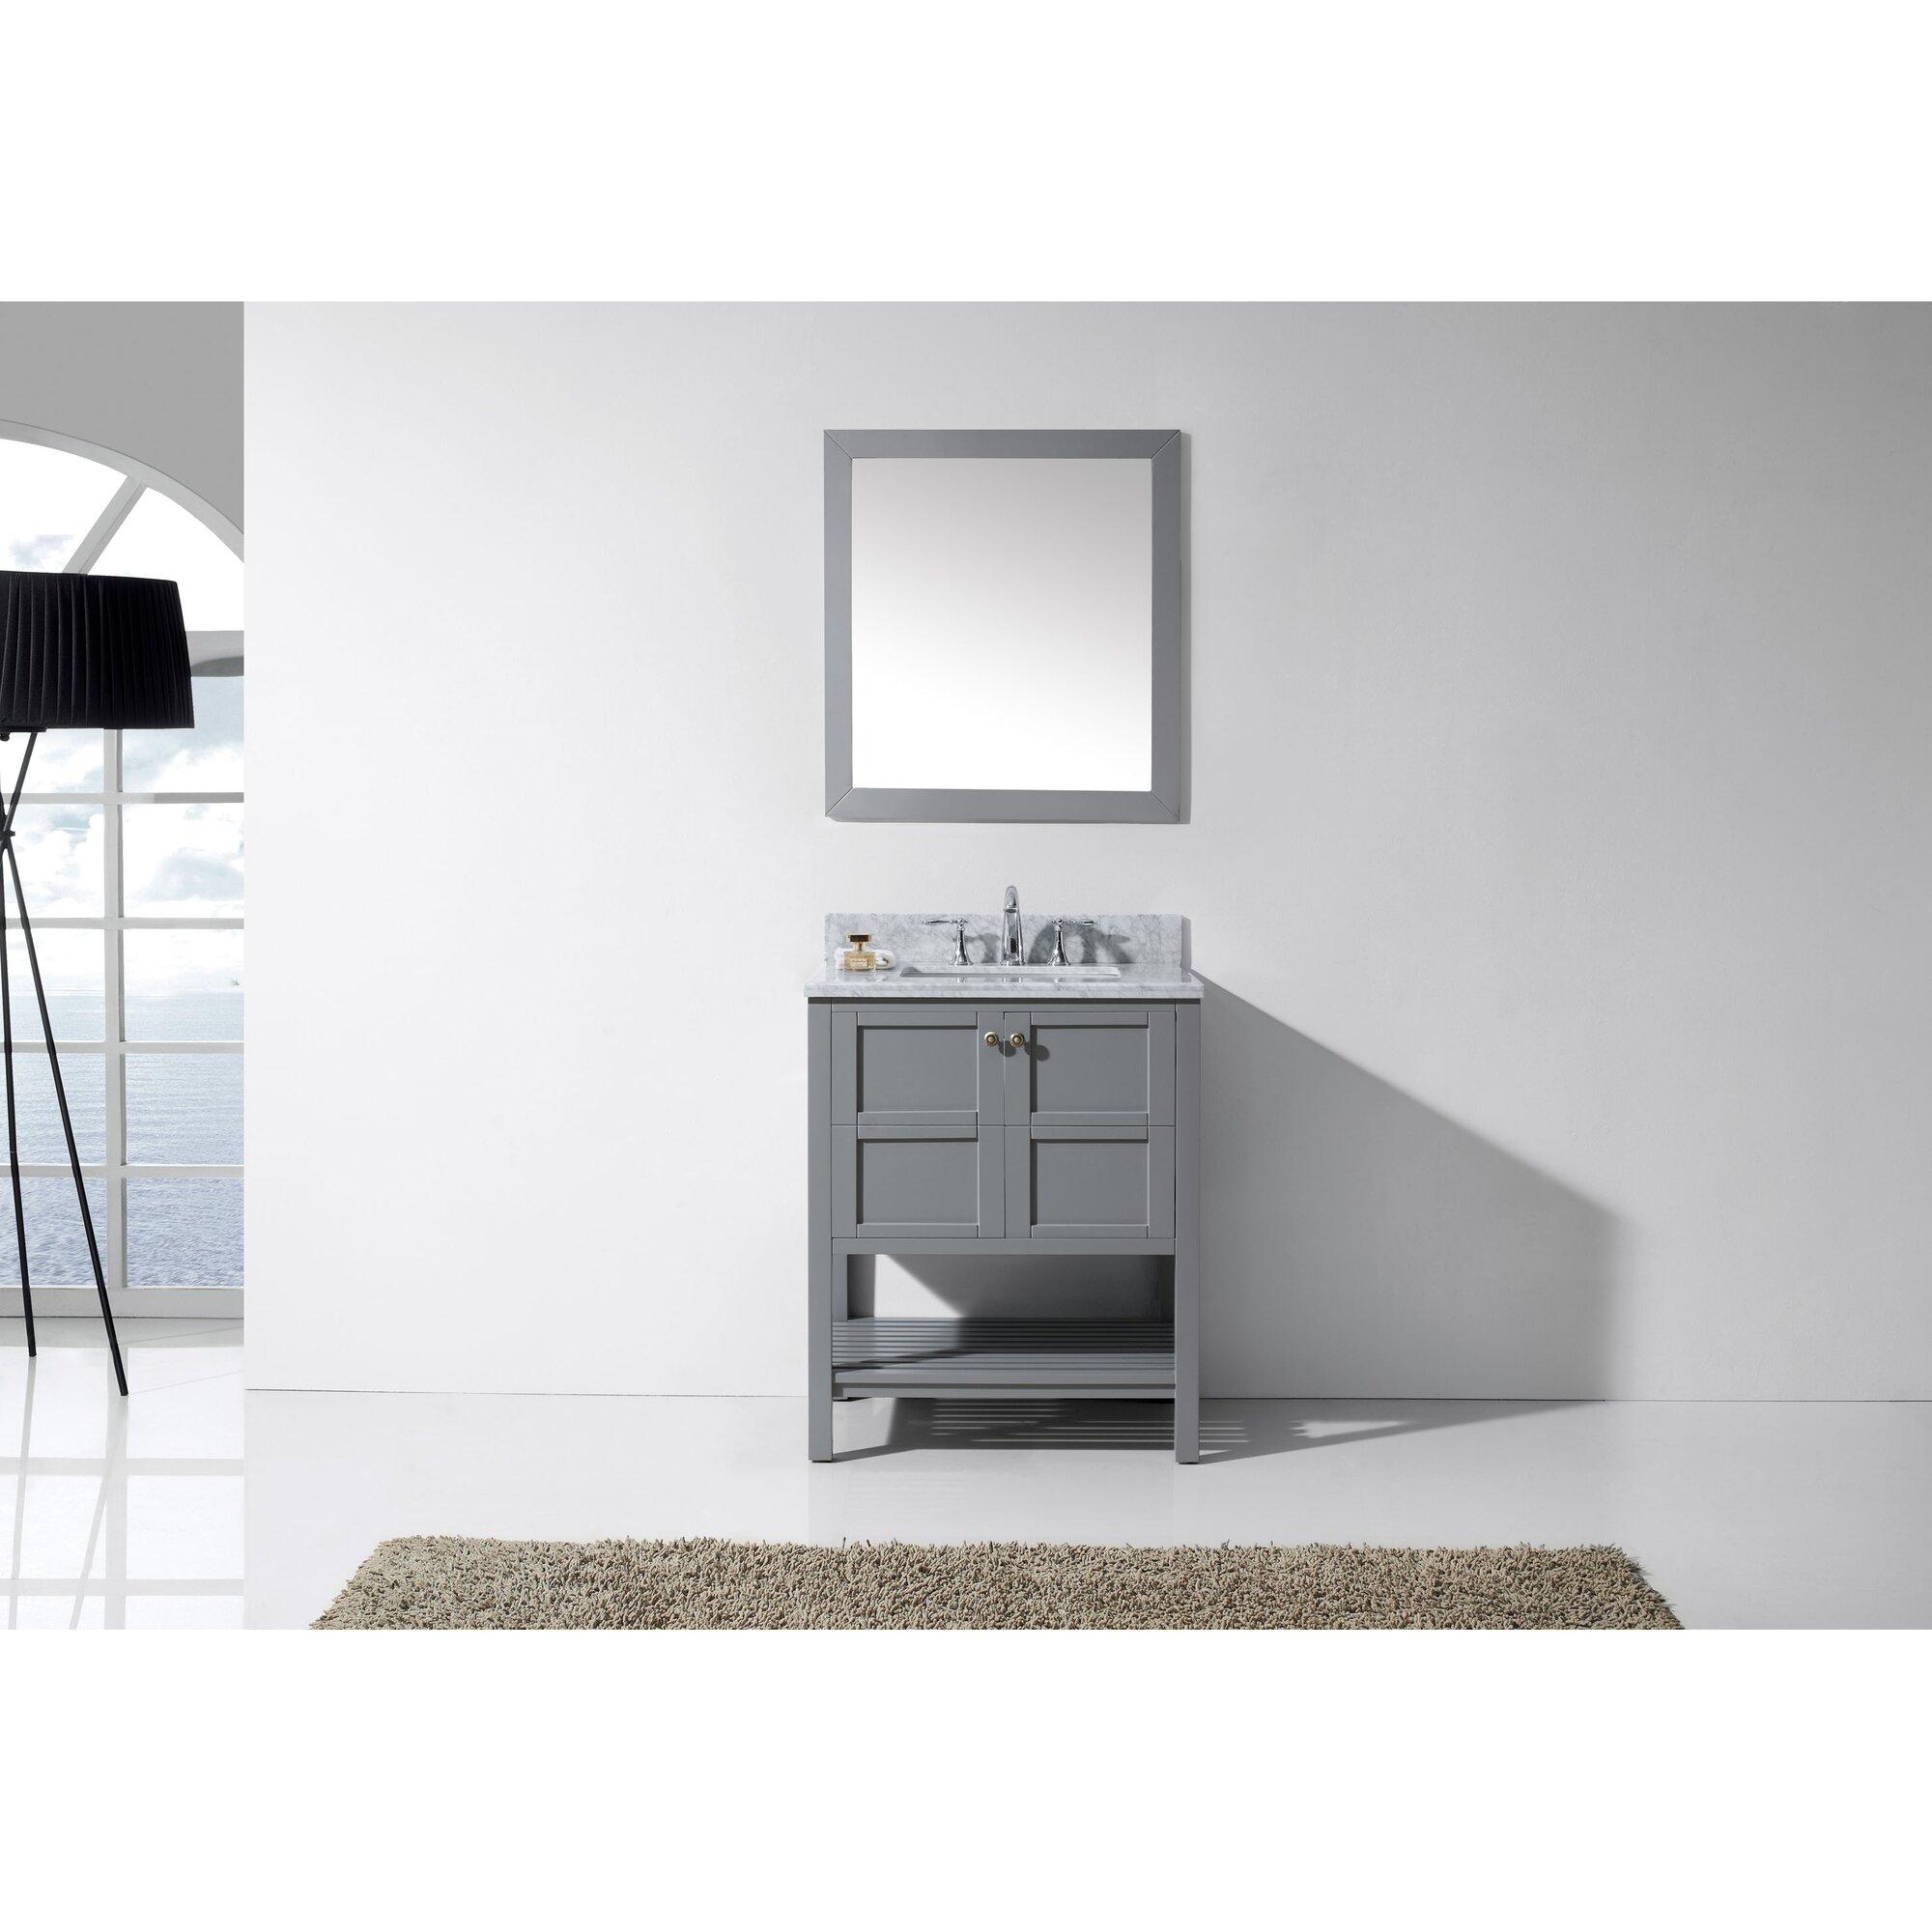 30 Bathroom Vanity With Top ~ Instavanity